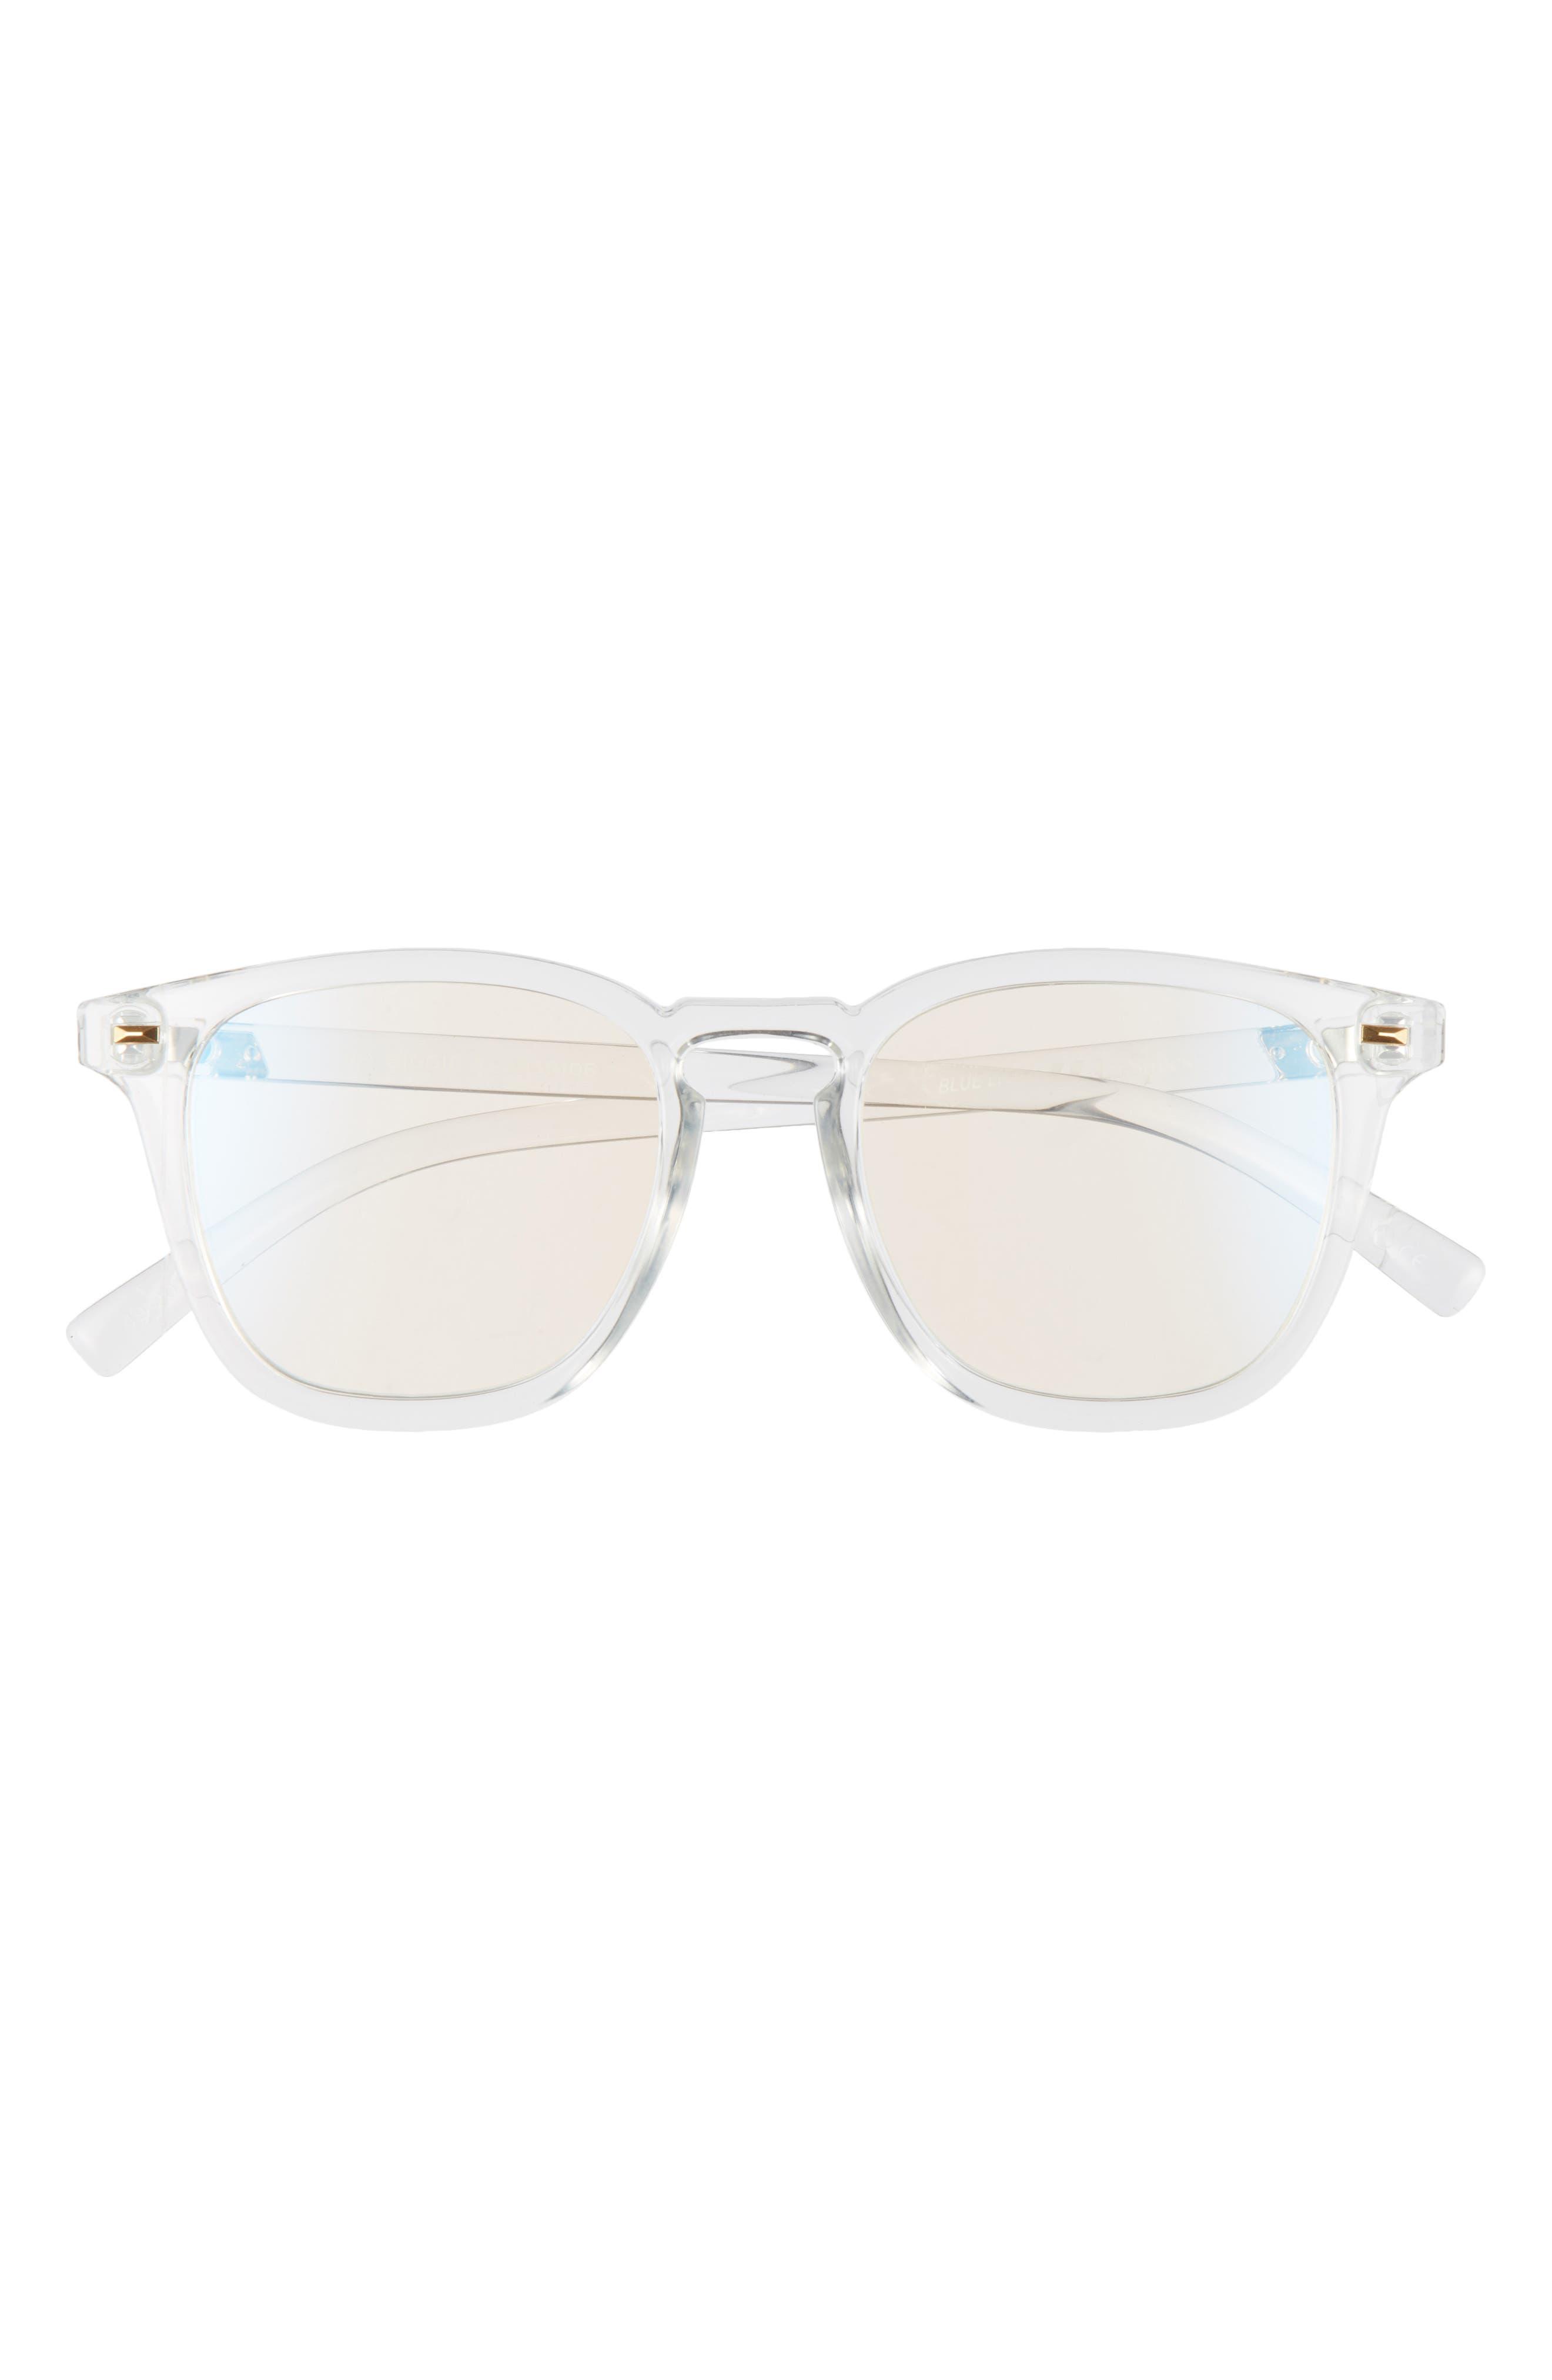 No Biggie 49mm Blue Light Blocking Glasses